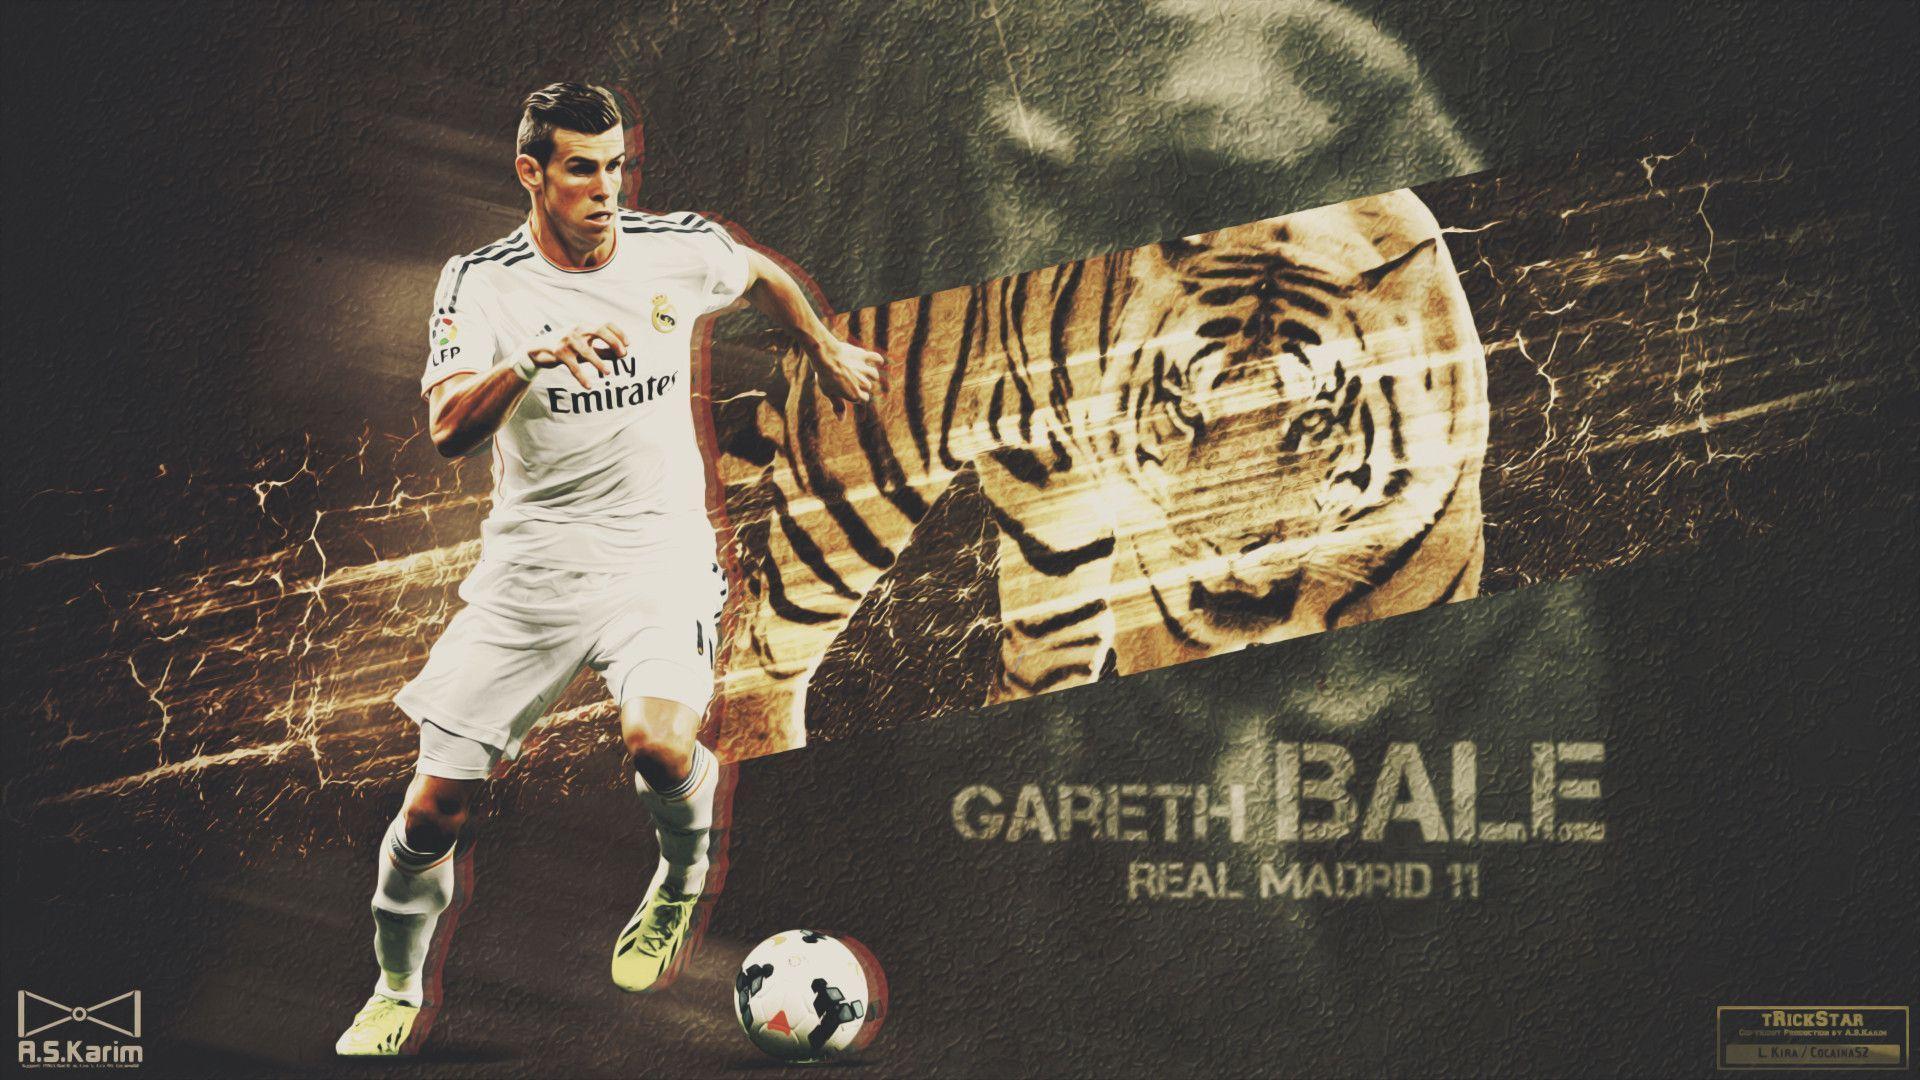 2014 Gareth Bale HD Wallpapers | HD Wallpapers Store